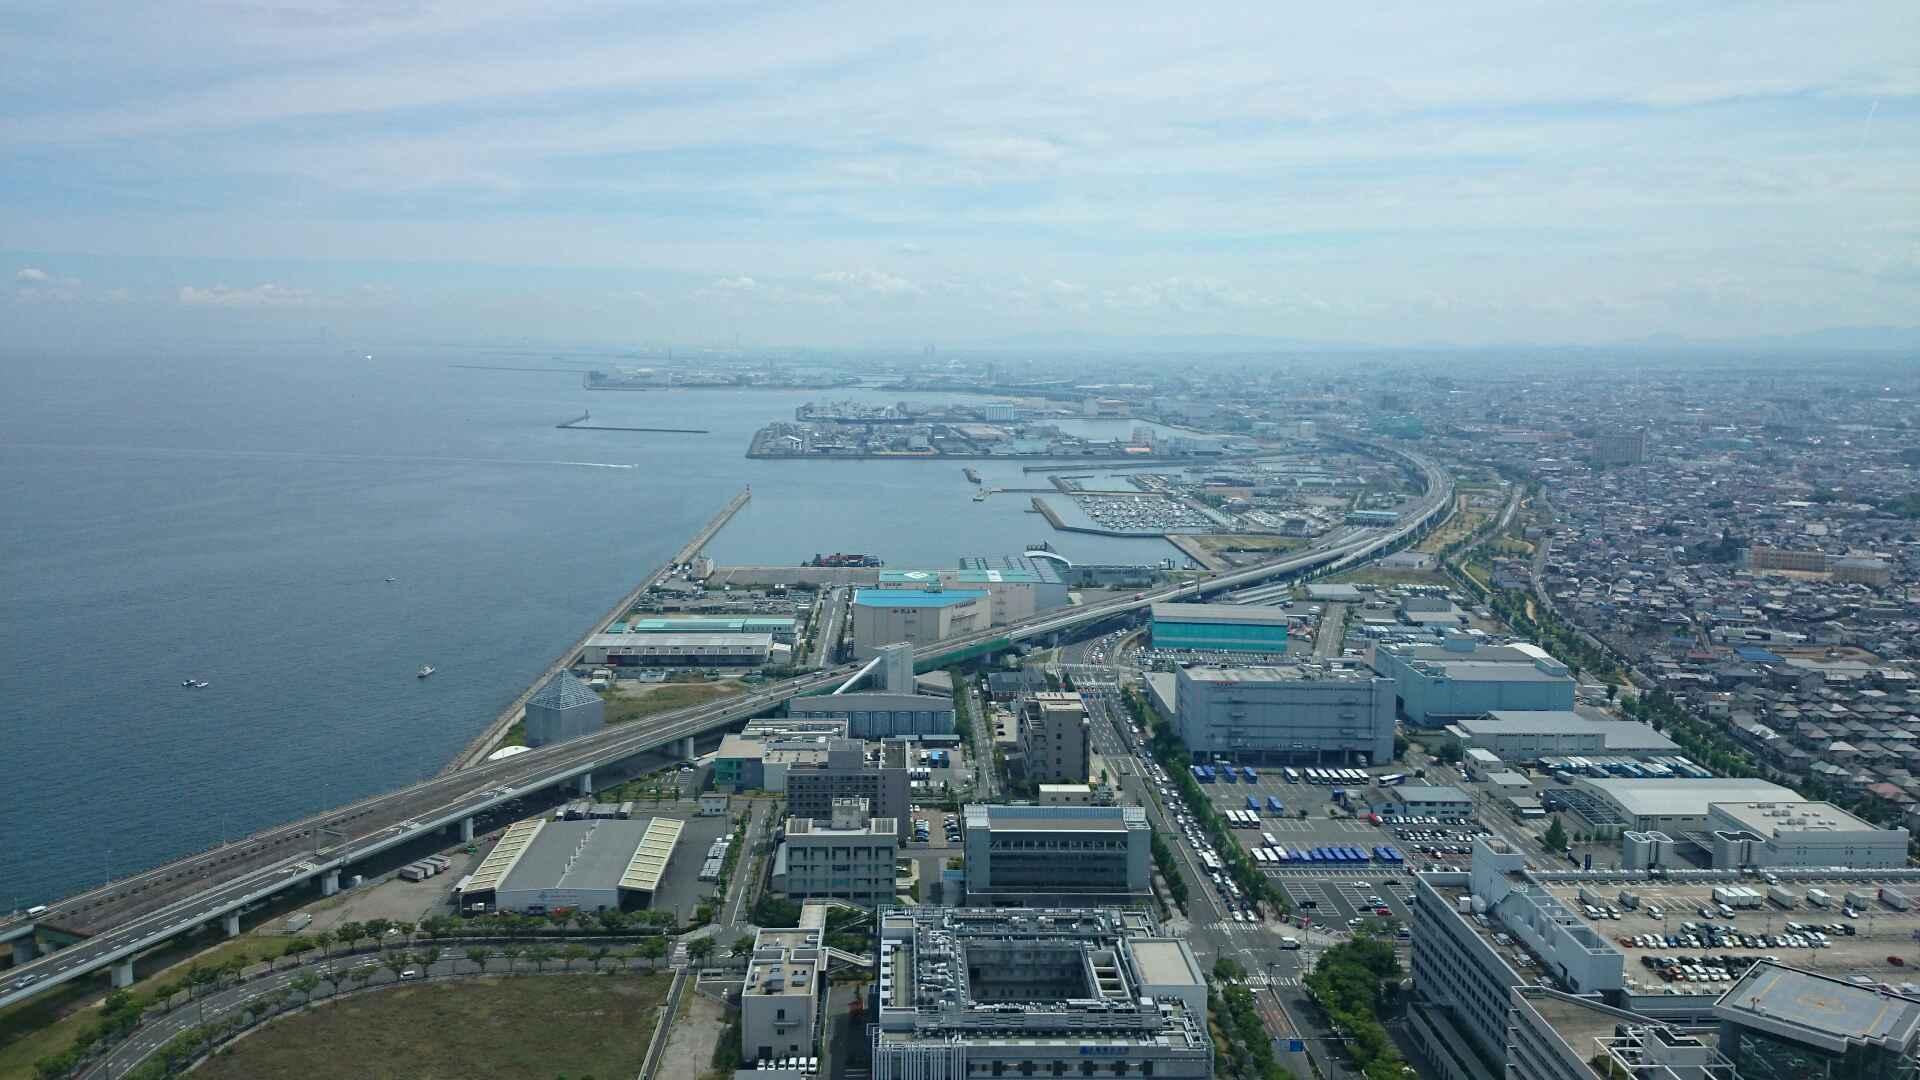 star gate hotel kansai airport osaka (大阪星际之门关西国际机场